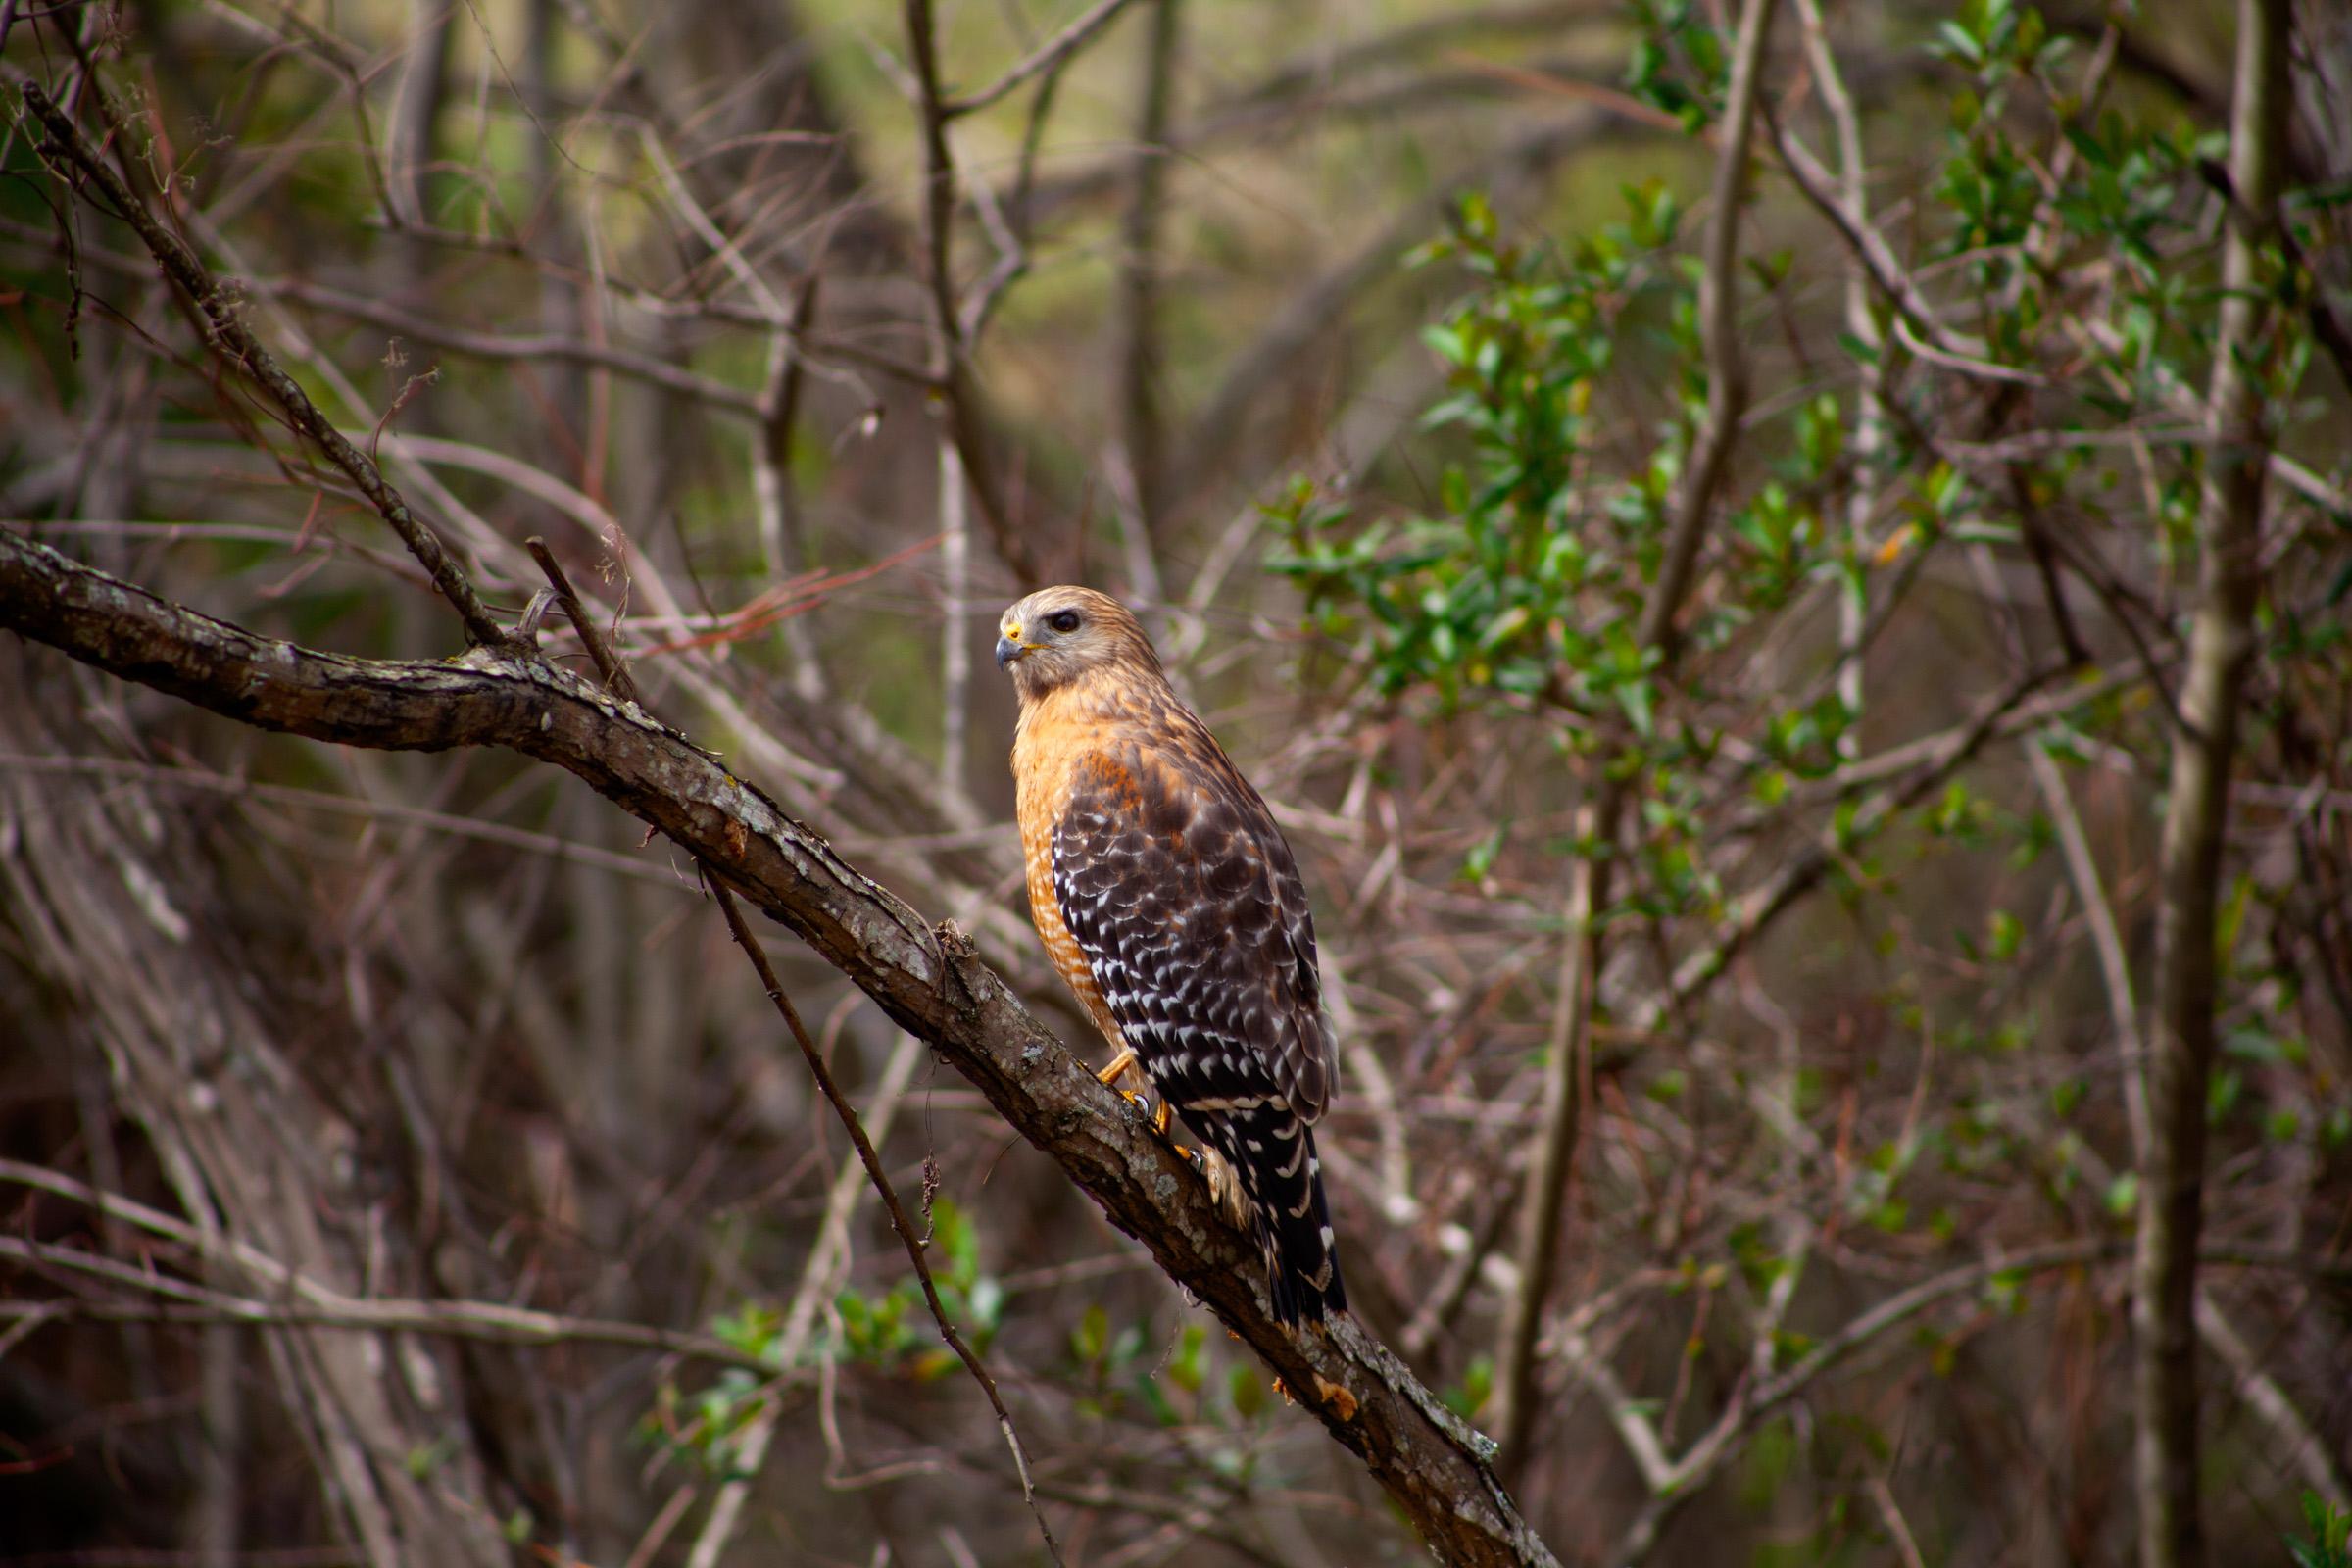 Red Shouldered Hawk - Click for more images